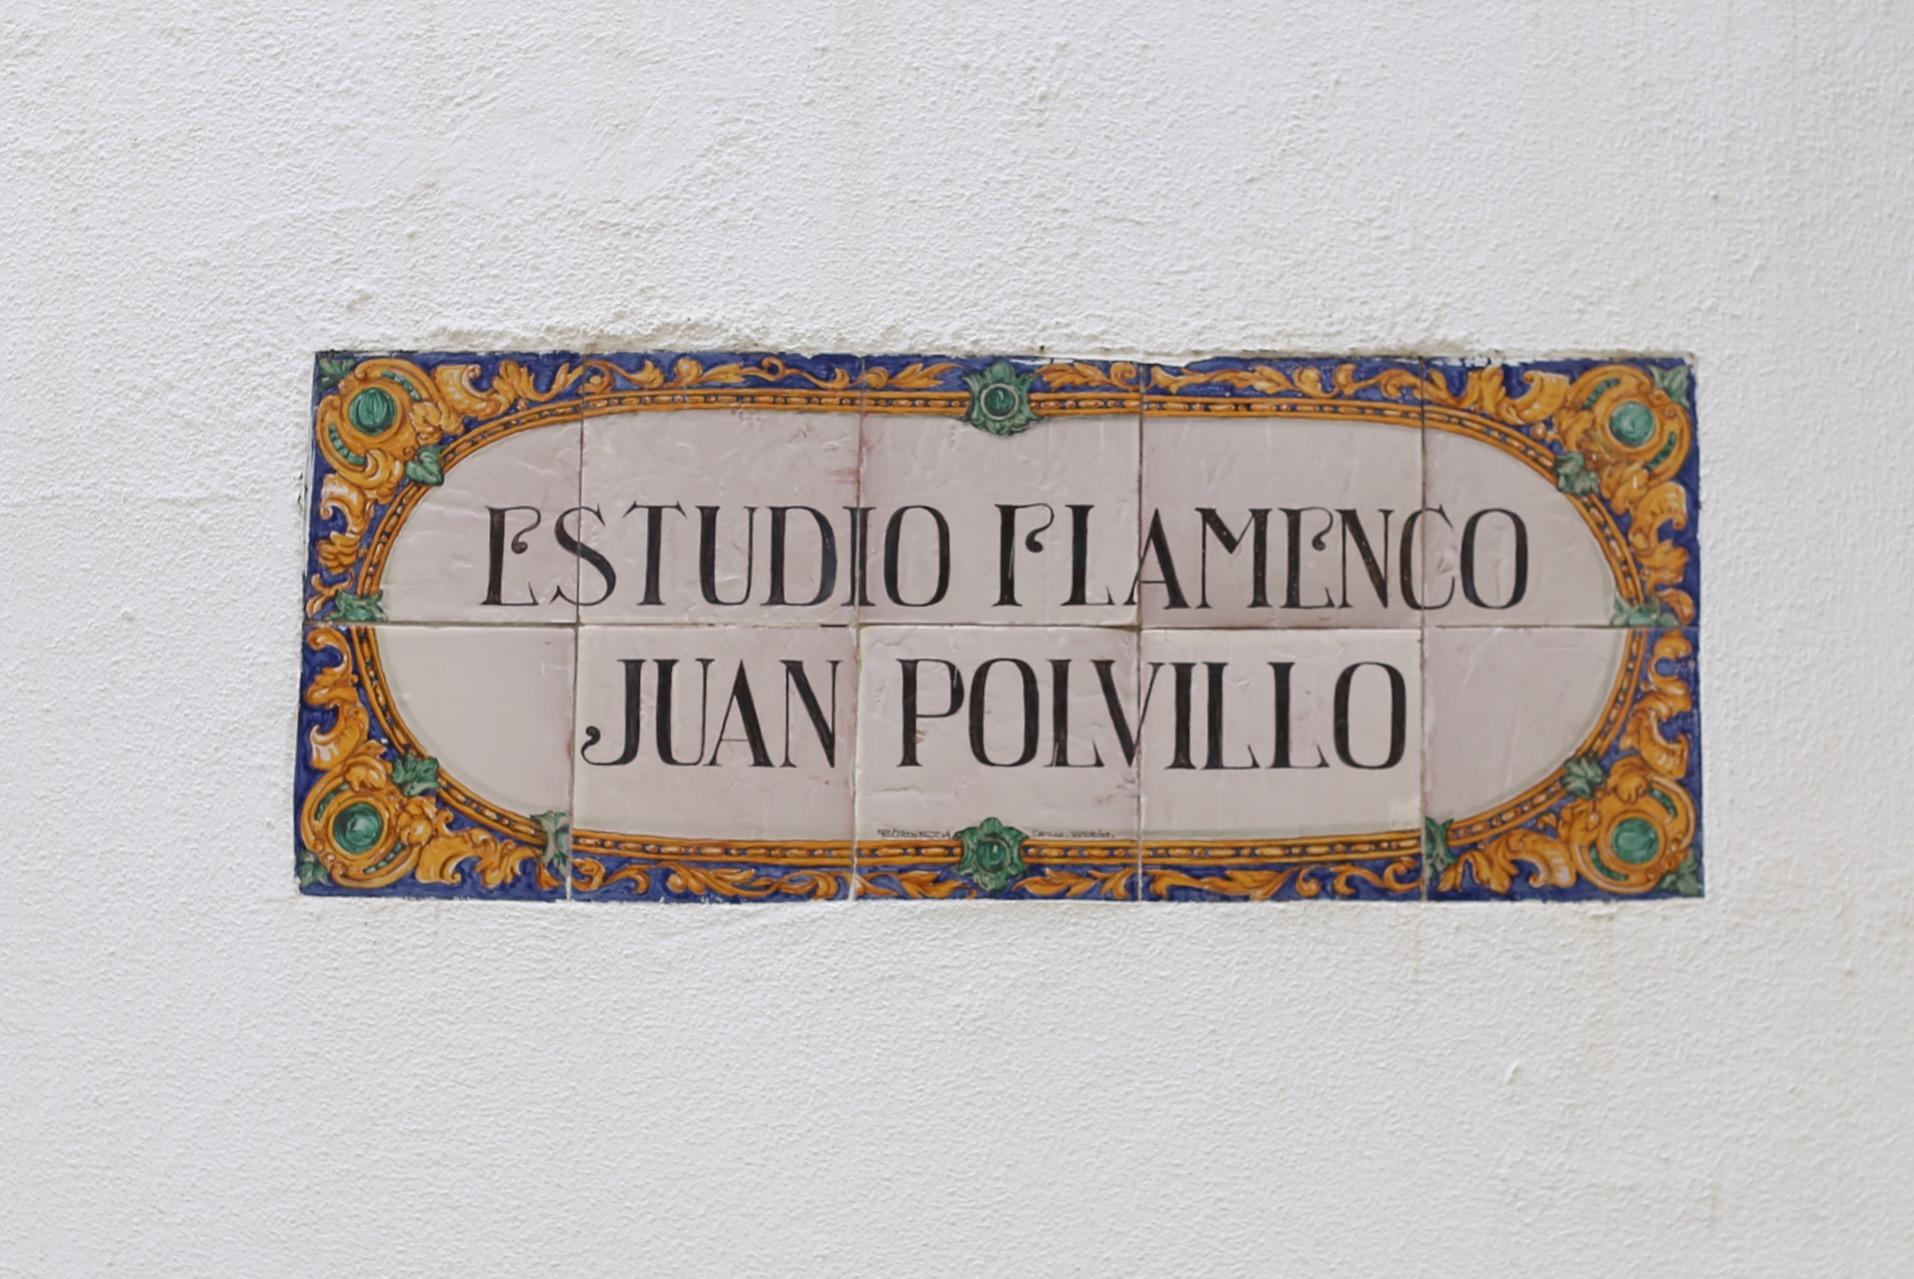 estudio flamenca